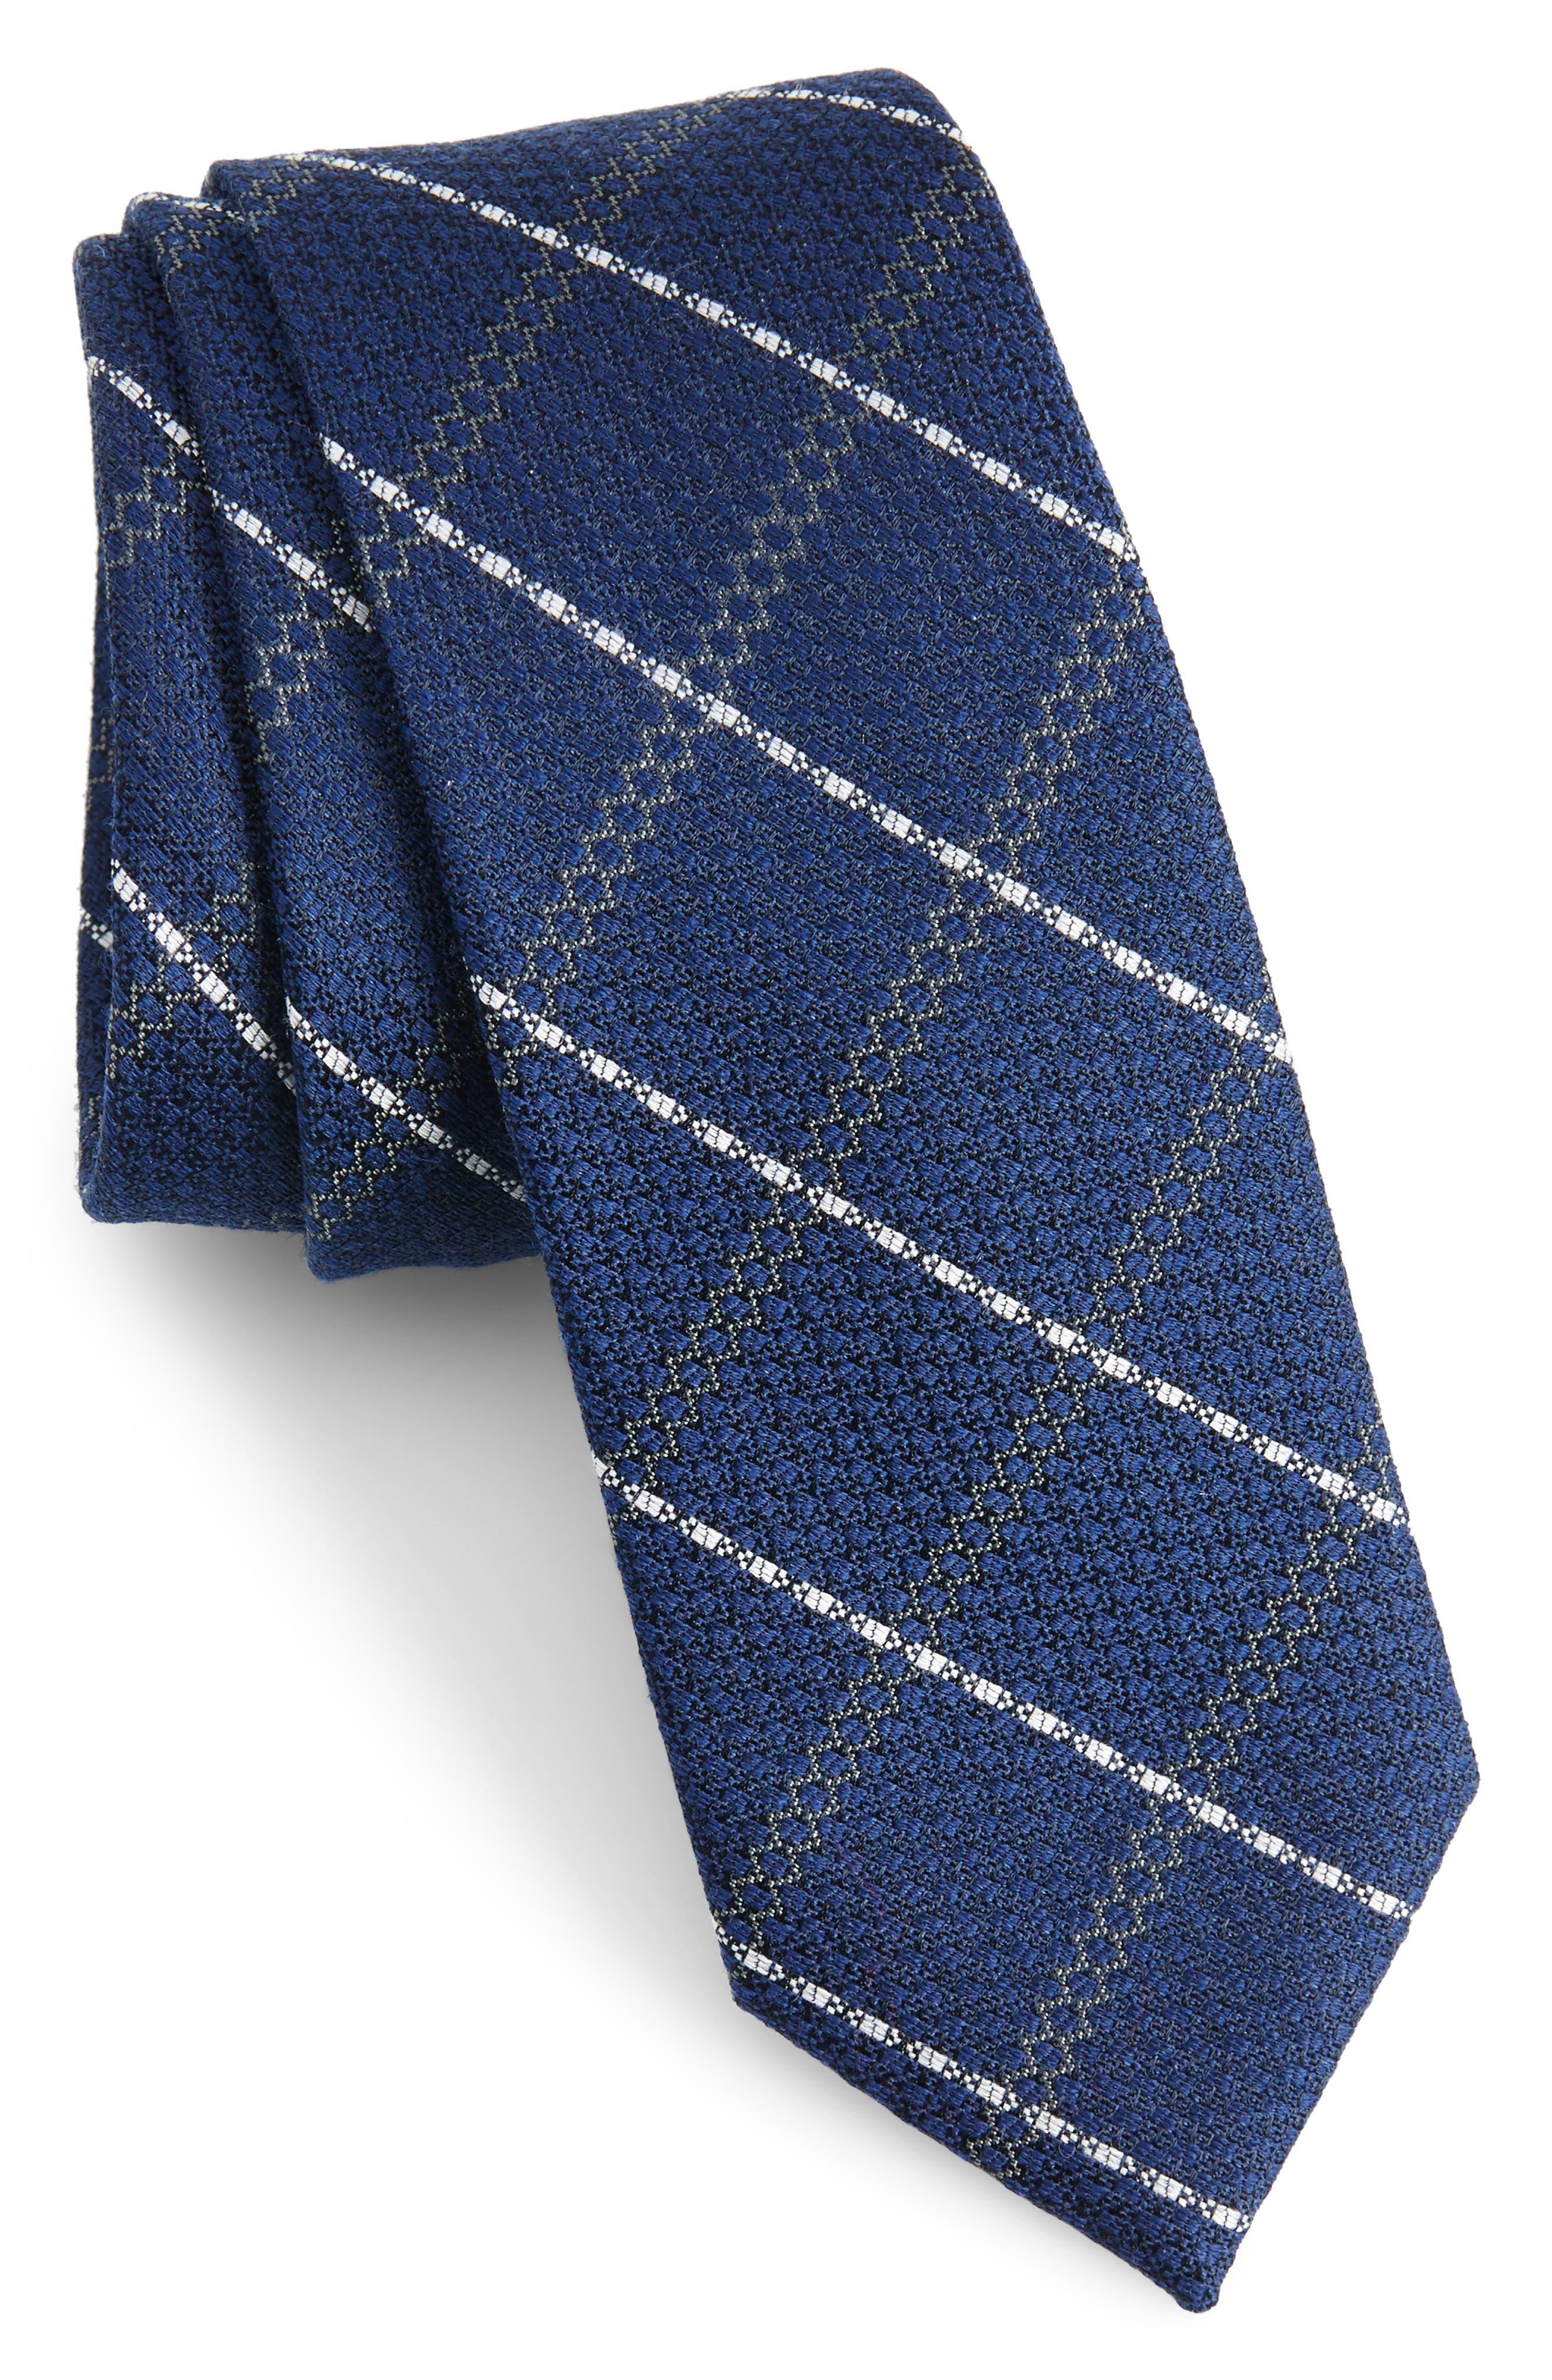 Plaid Silk & Wool Tie,                             Main thumbnail 1, color,                             NAVY